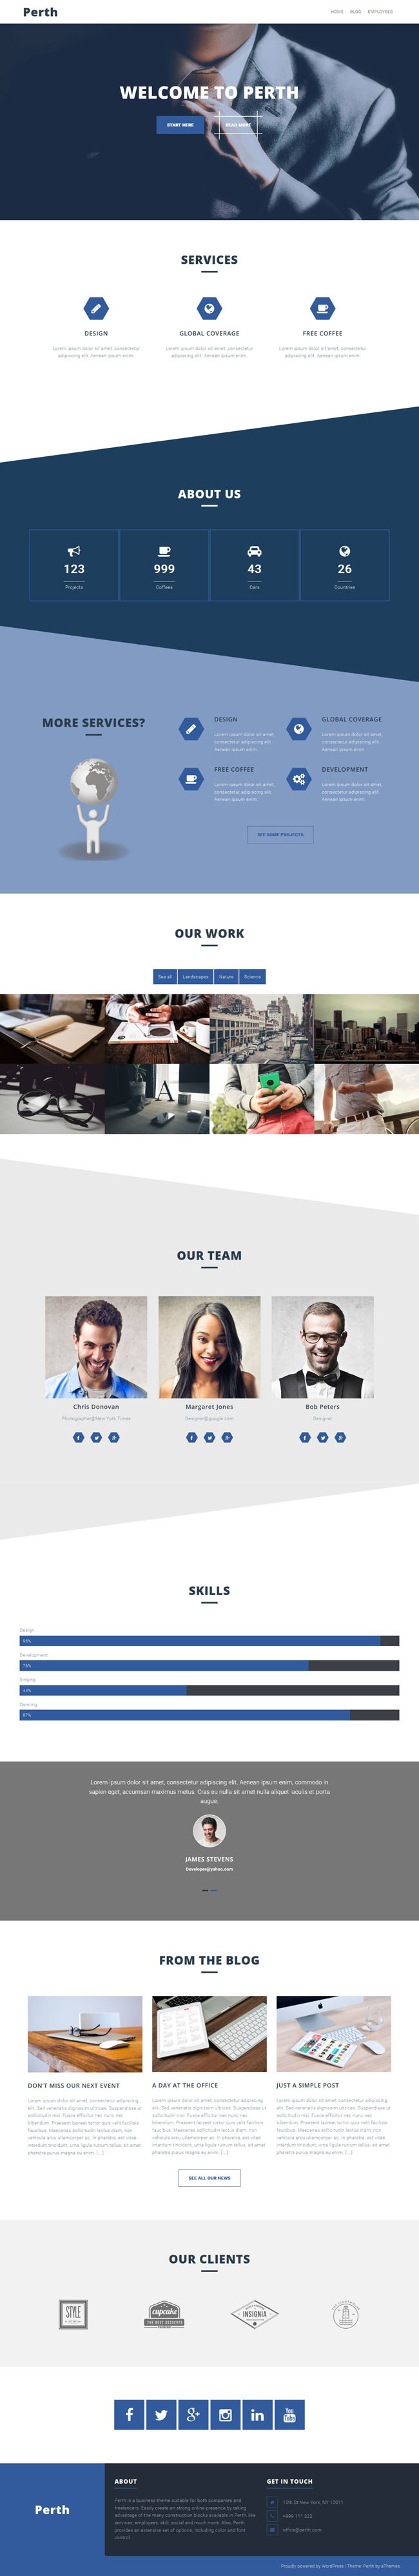 Perth-business-wordpress-theme-06